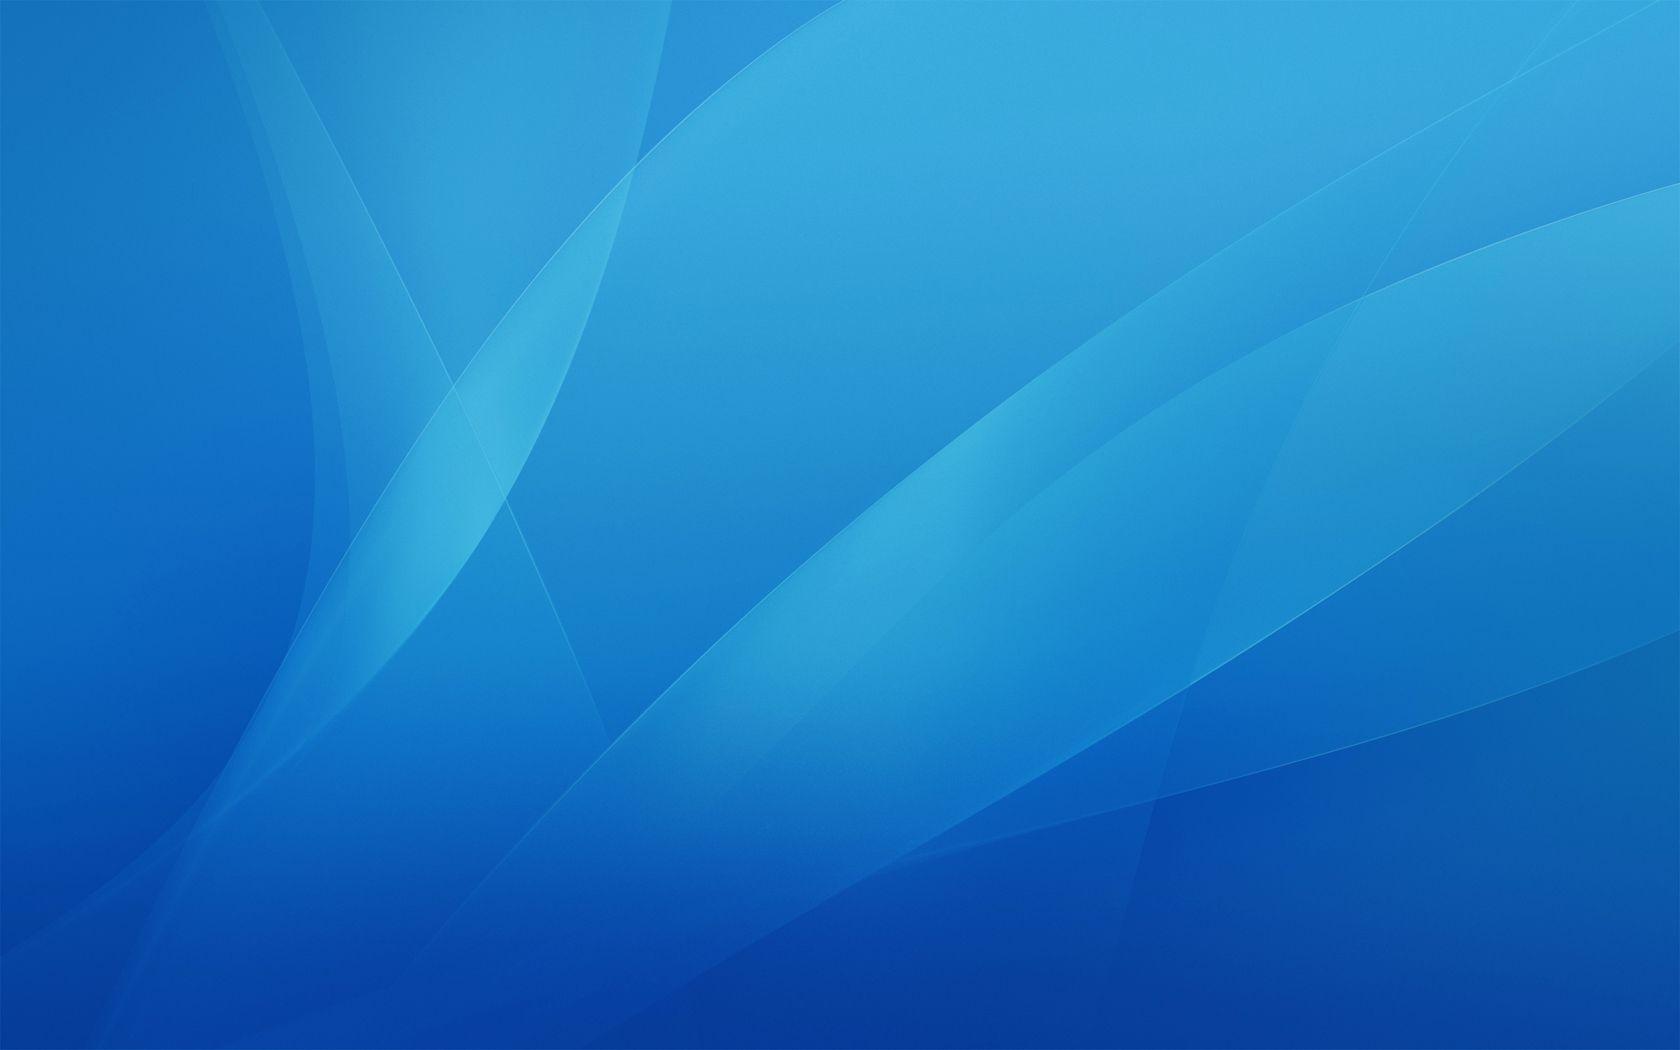 Blue Sky Wallpaper Desktop Blue Background Wallpapers Mac